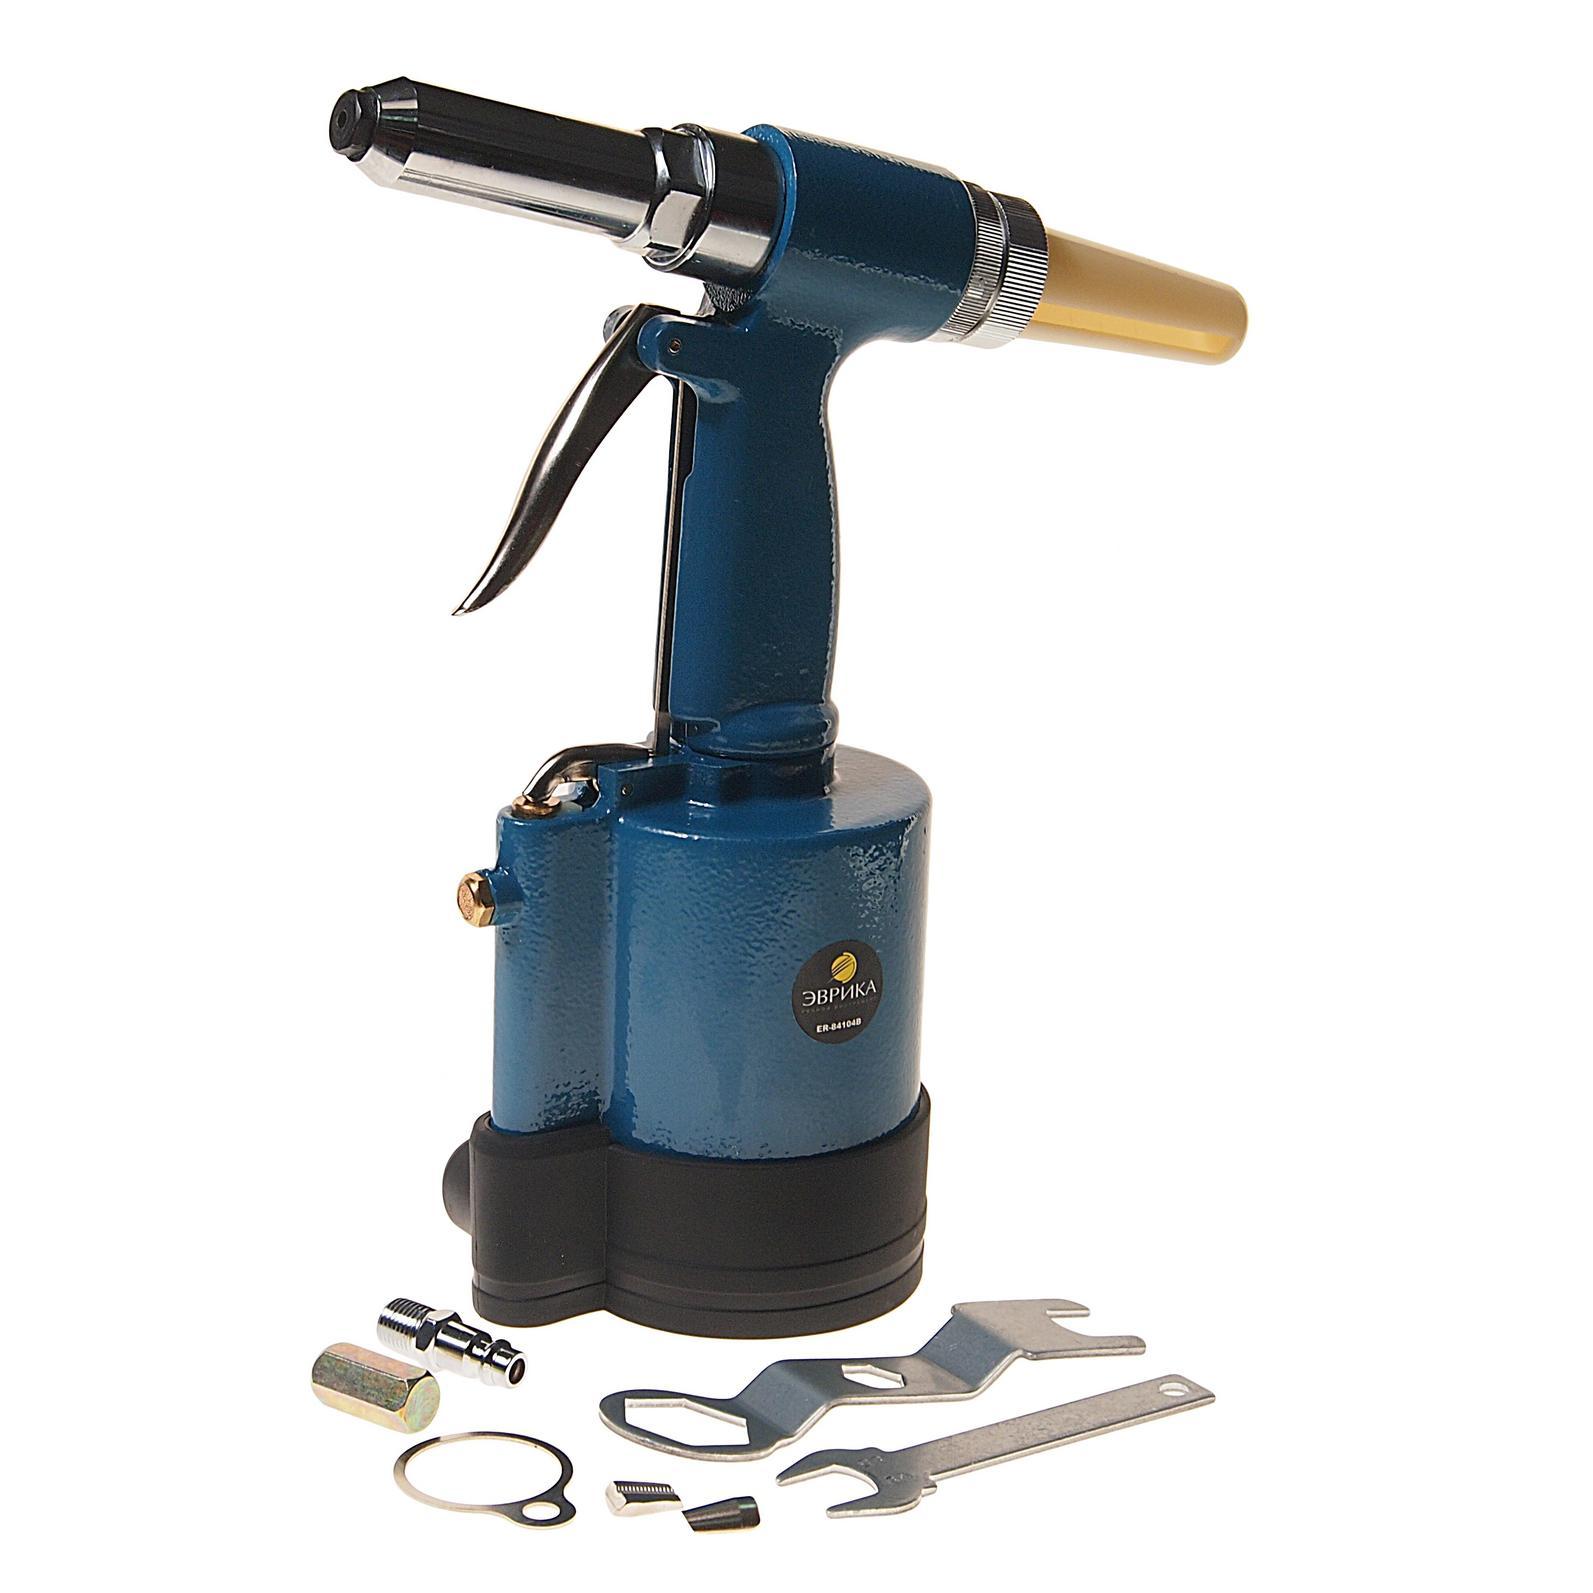 Заклепочник пневматический ЭВРИКА Er-84104b набор инструмента эврика er tk4010